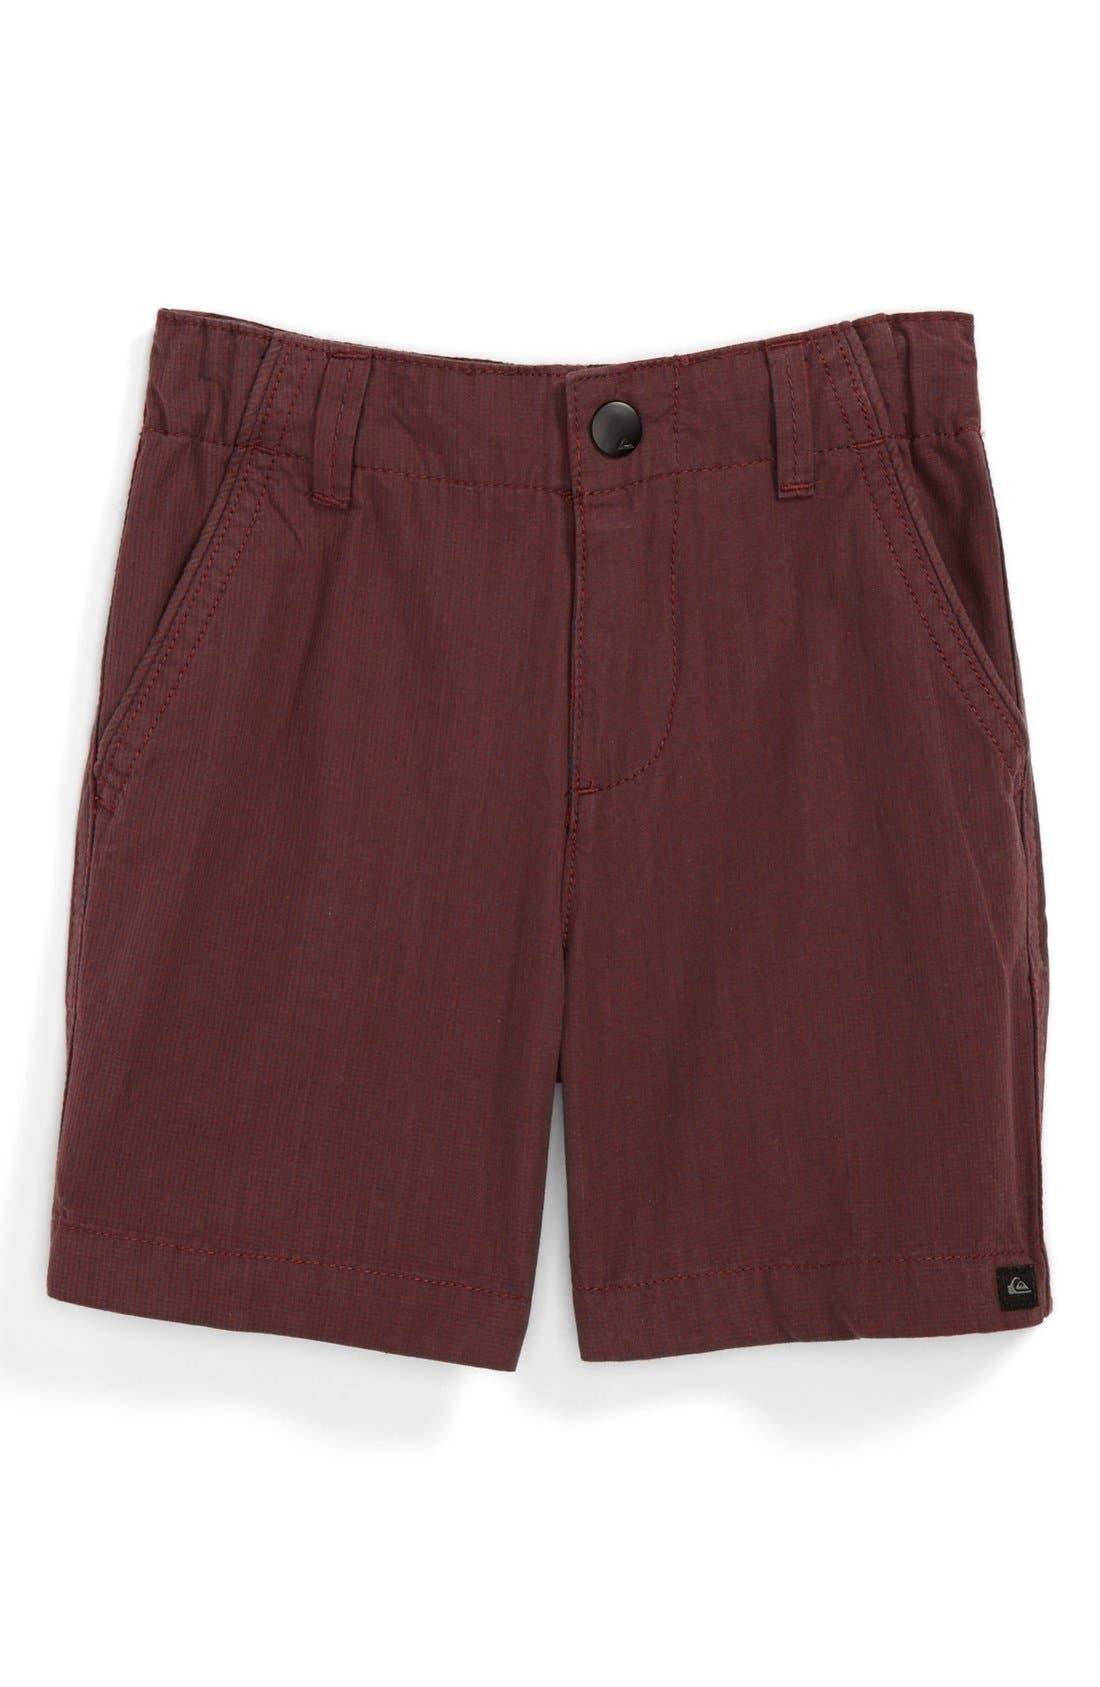 Main Image - Quiksilver 'Nugget' Shorts (Baby Boys)